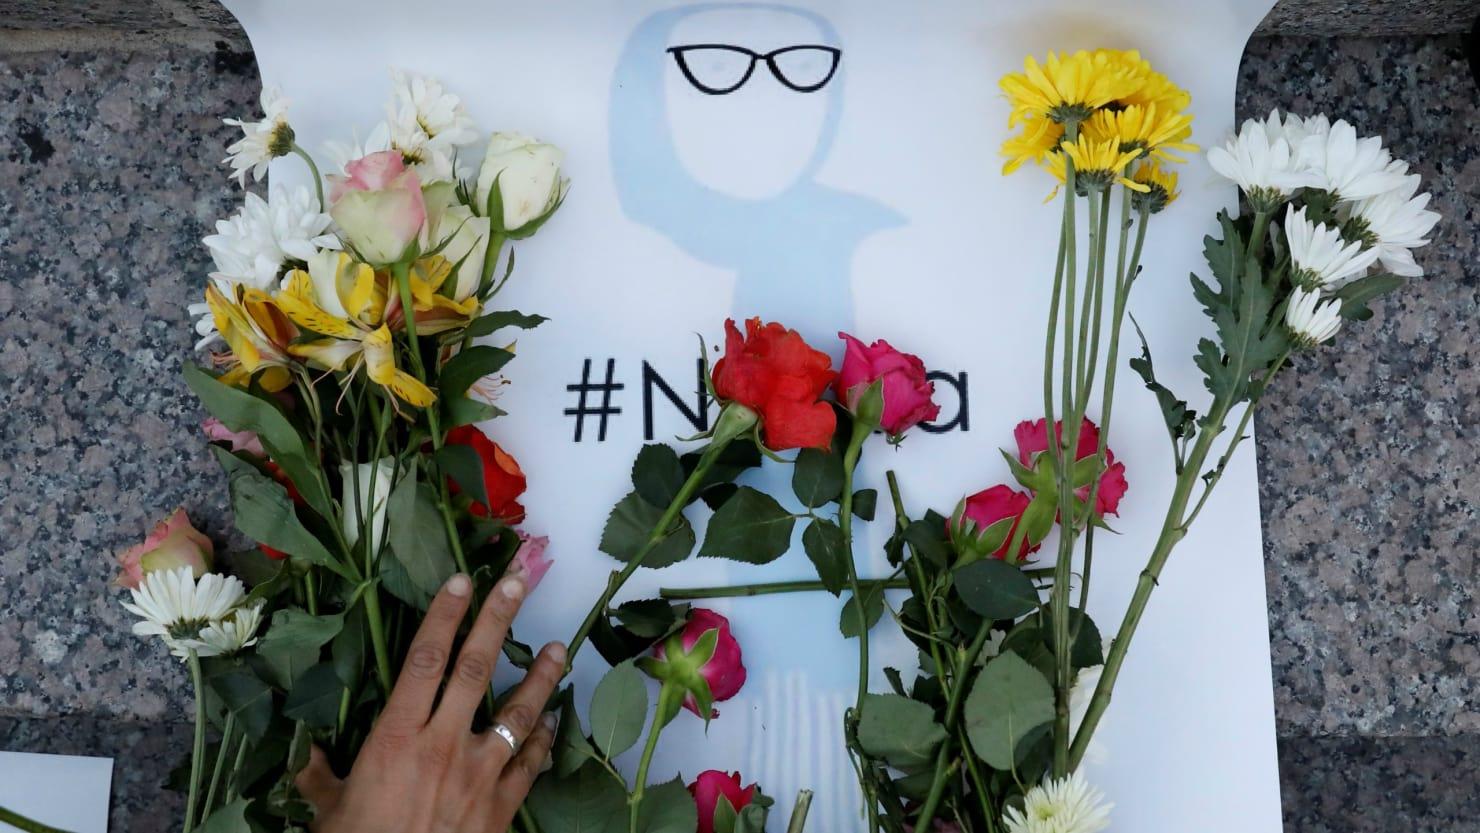 Memorial+of+Nabra+Hassanen+in+DuPont+Circle+in+Washington+D.C..